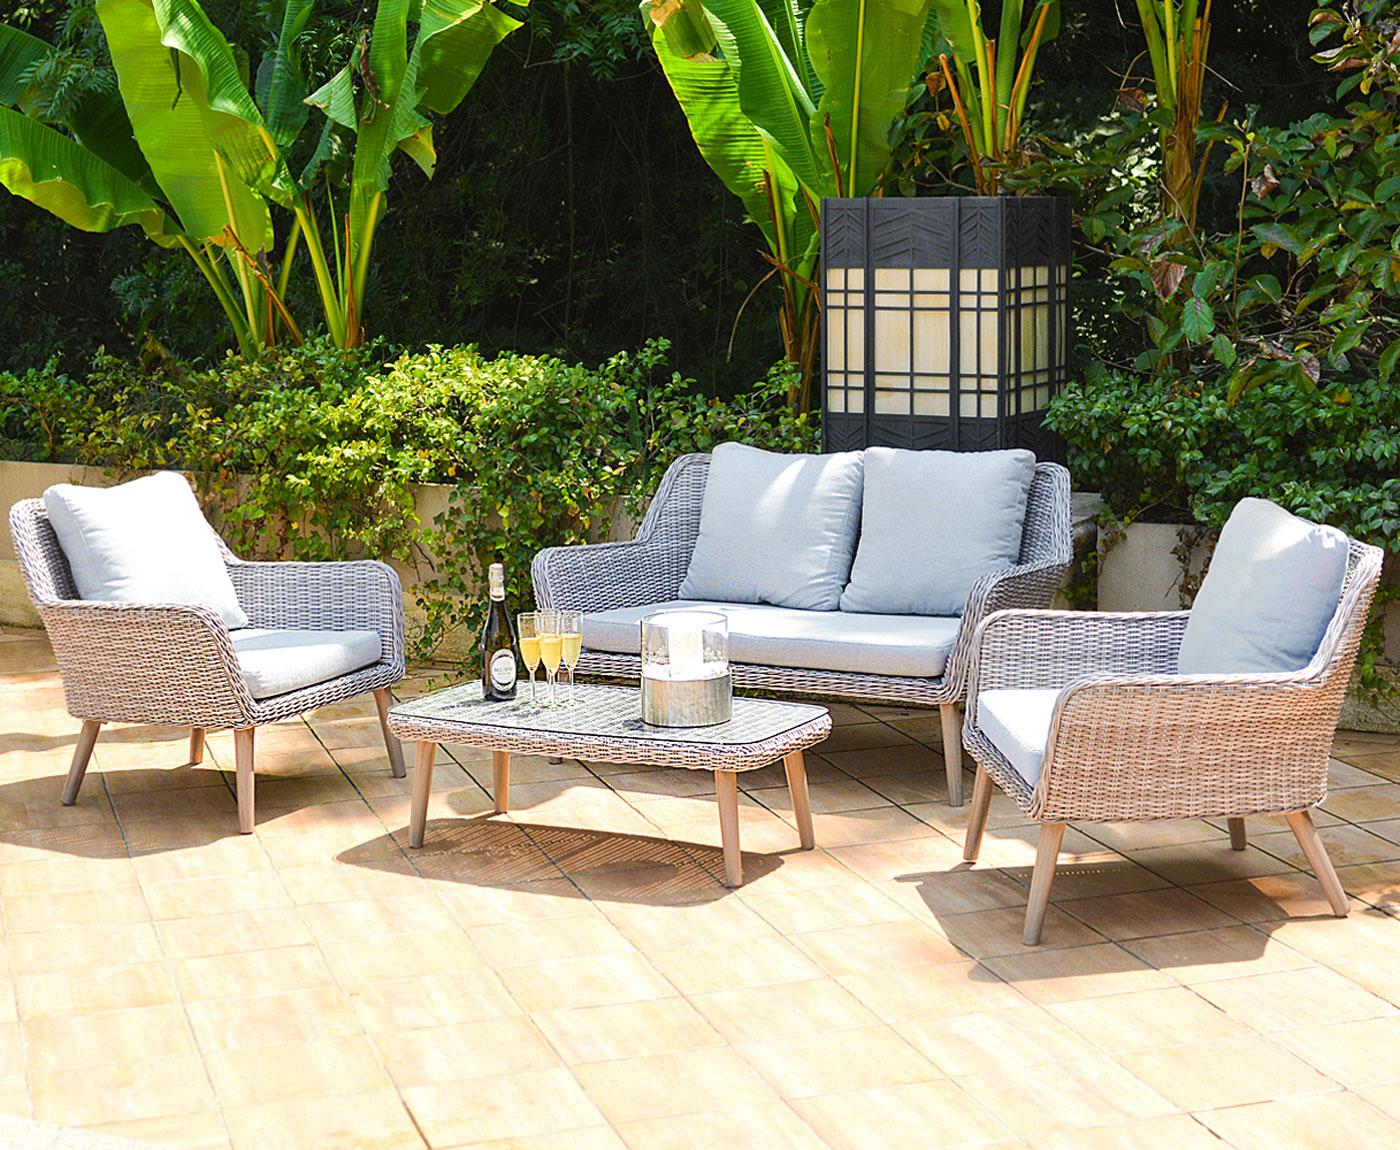 luxus poly rattan garnitur bilbao premium garten set alu gestell ebay. Black Bedroom Furniture Sets. Home Design Ideas